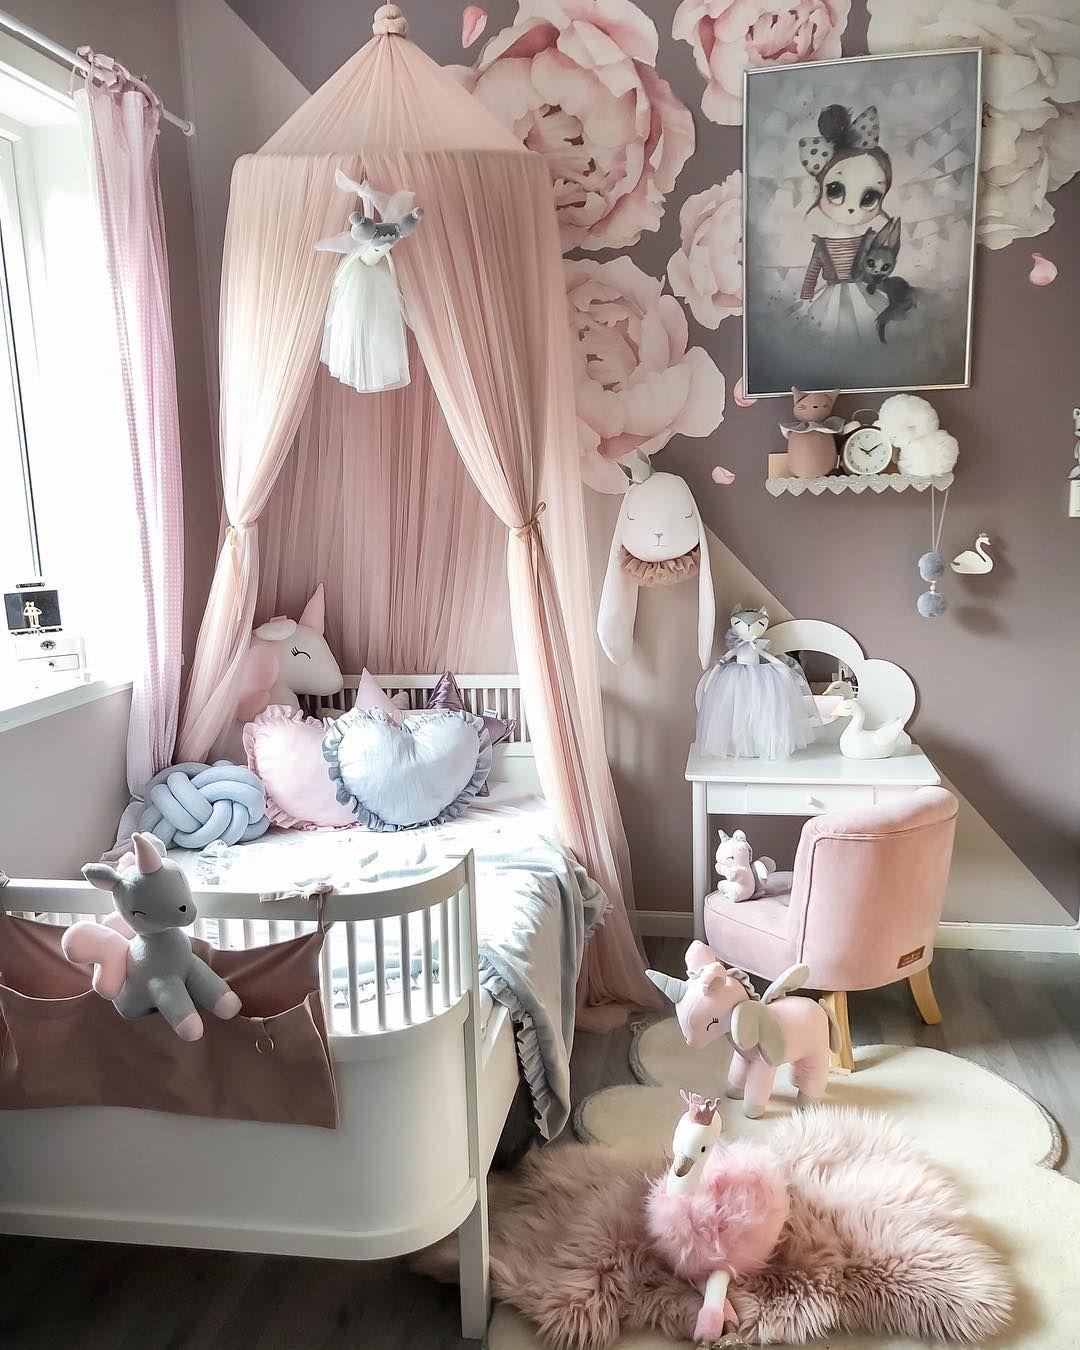 Absolutely Adorable Little Girl Room Girl Room Toddler Bed